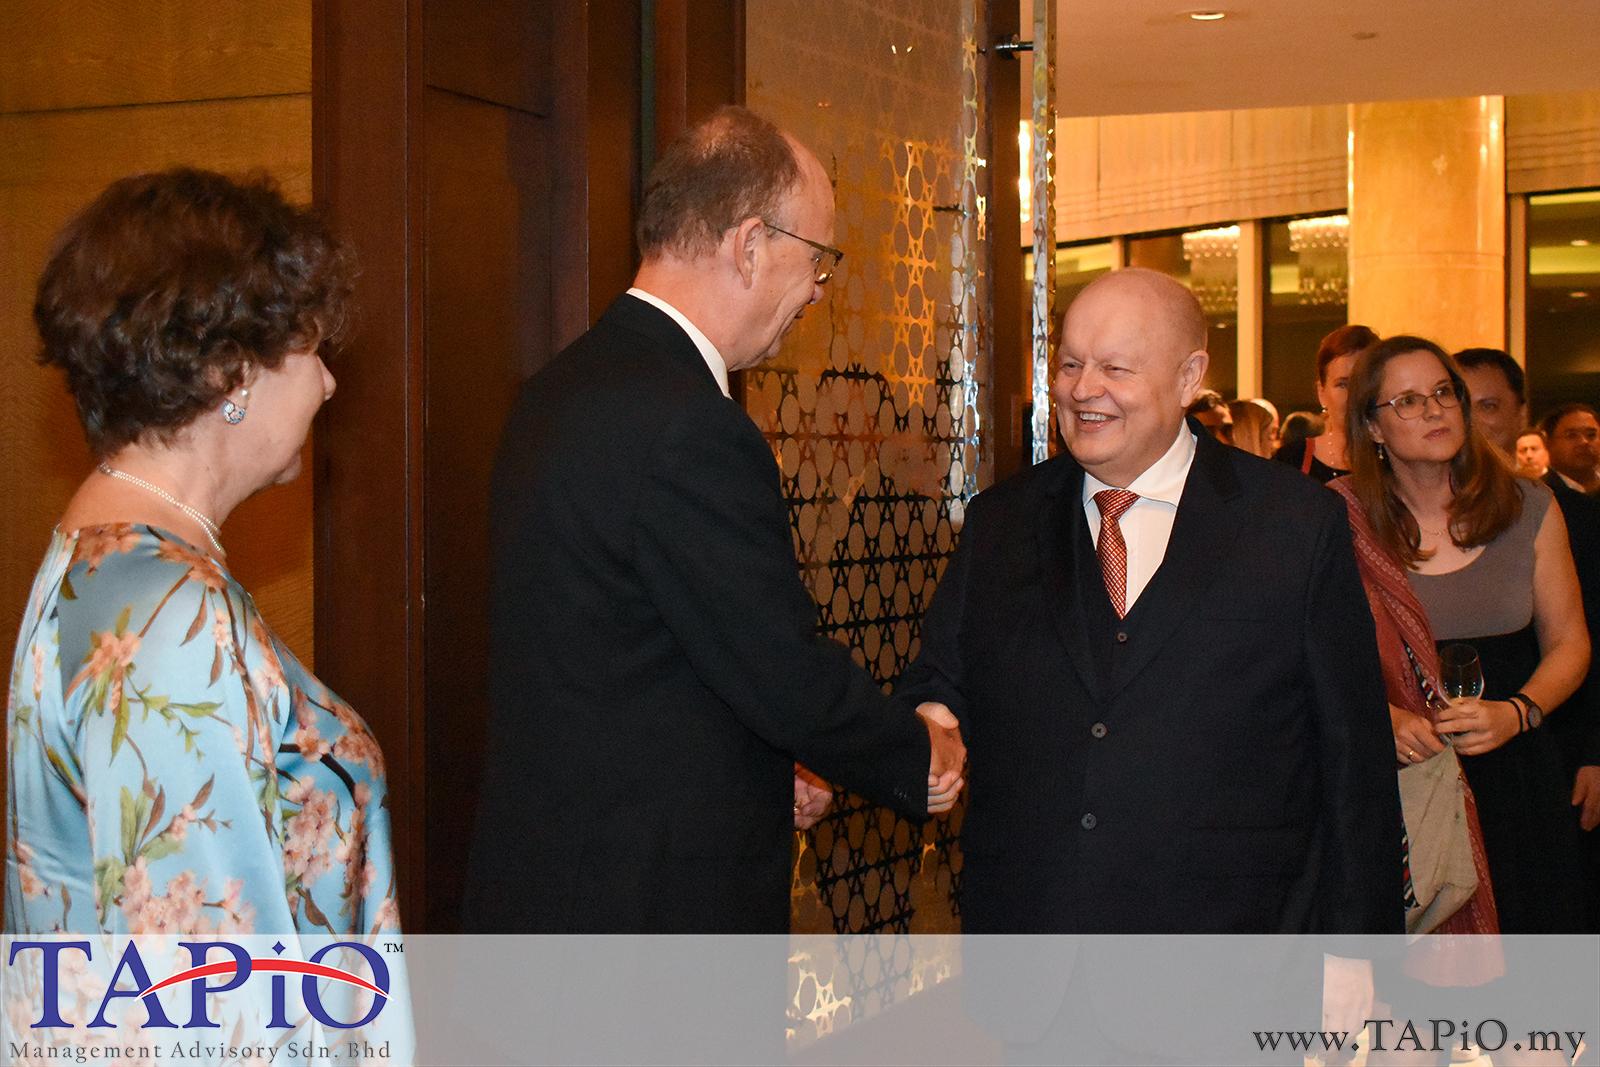 20191003 - German Unity Day 2019